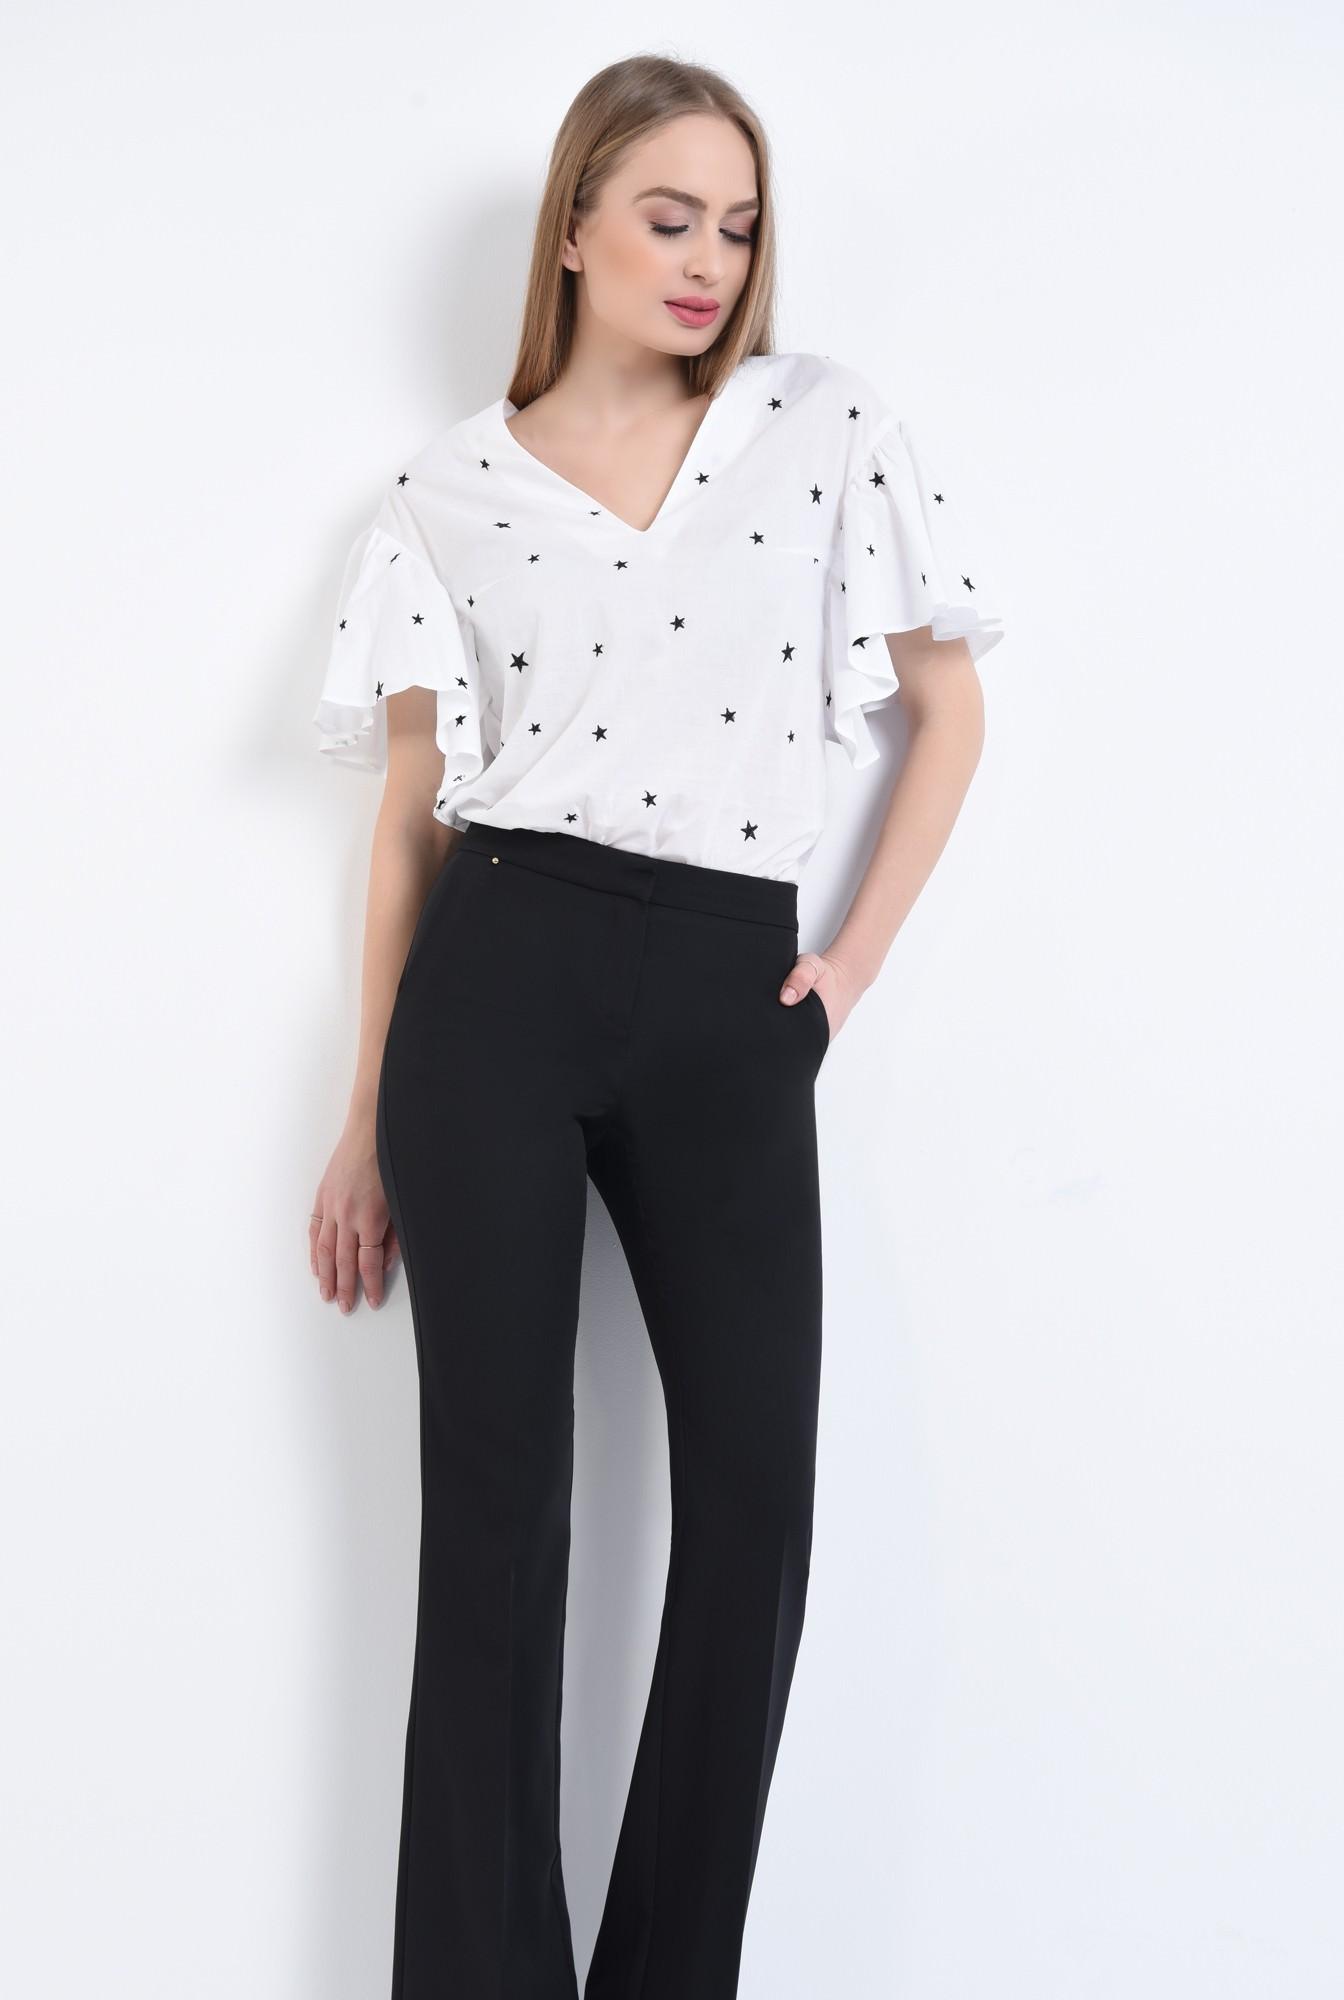 3 - Bluza casual, alb, anchior